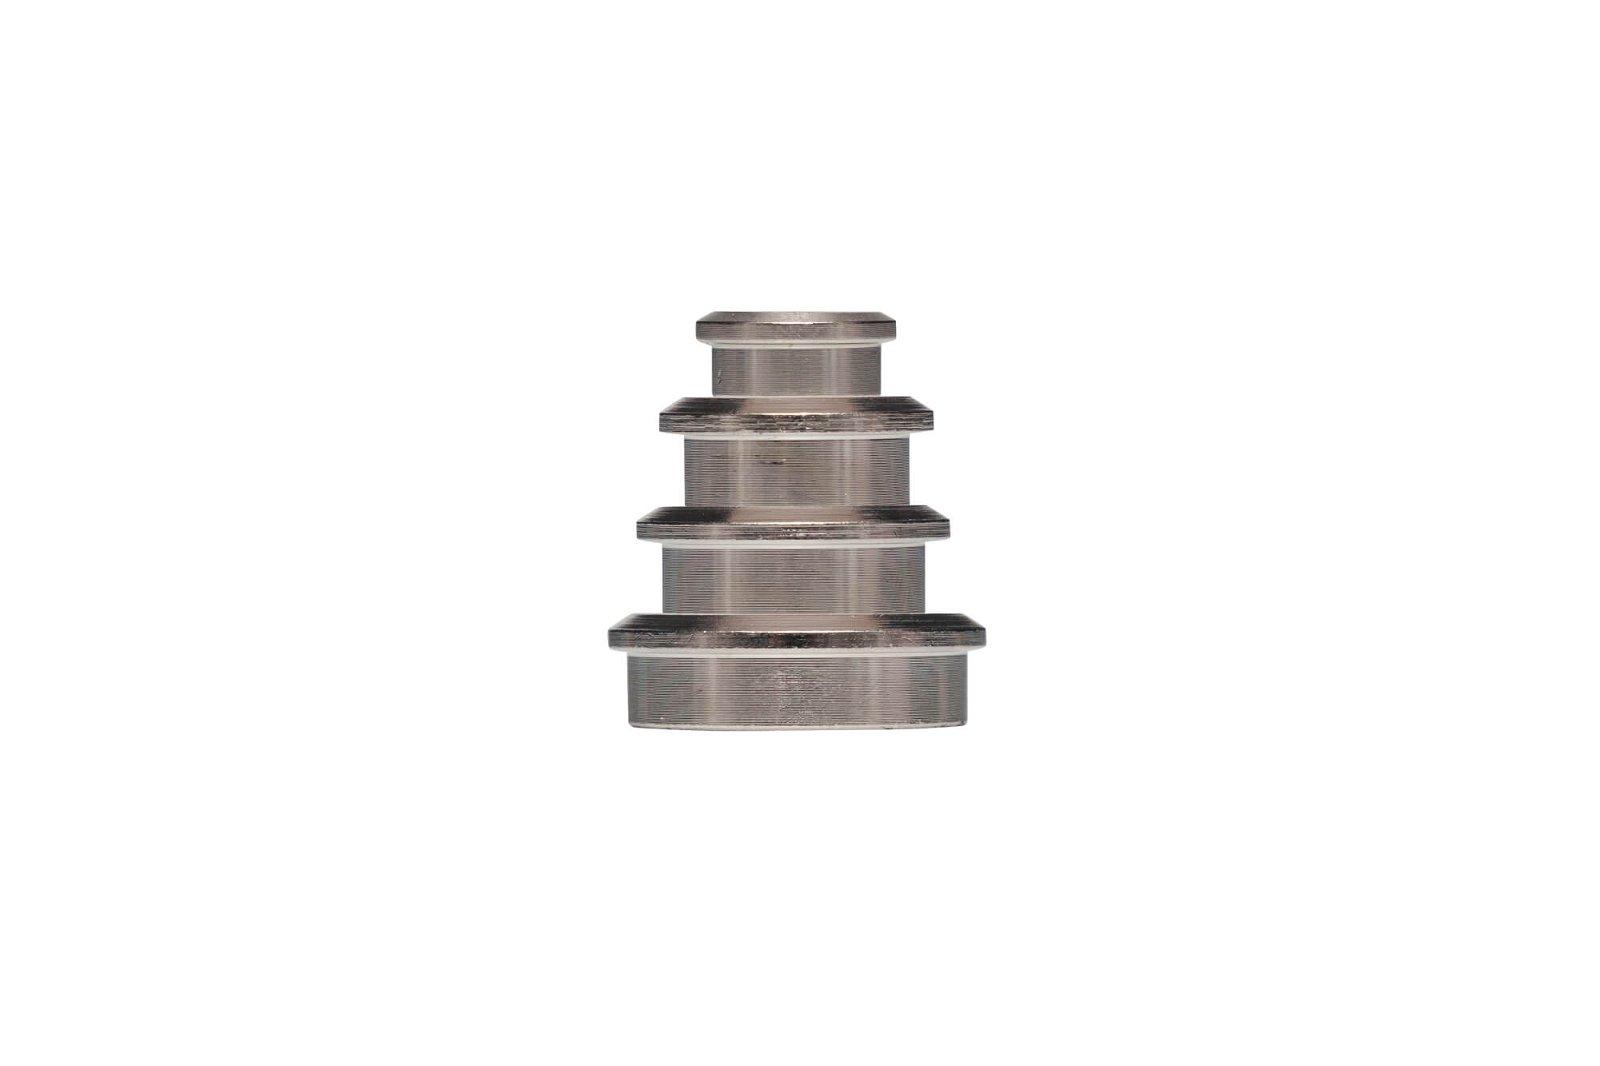 Neodym-Kraftmagnet SB, Ø 22 mm, 8 kg